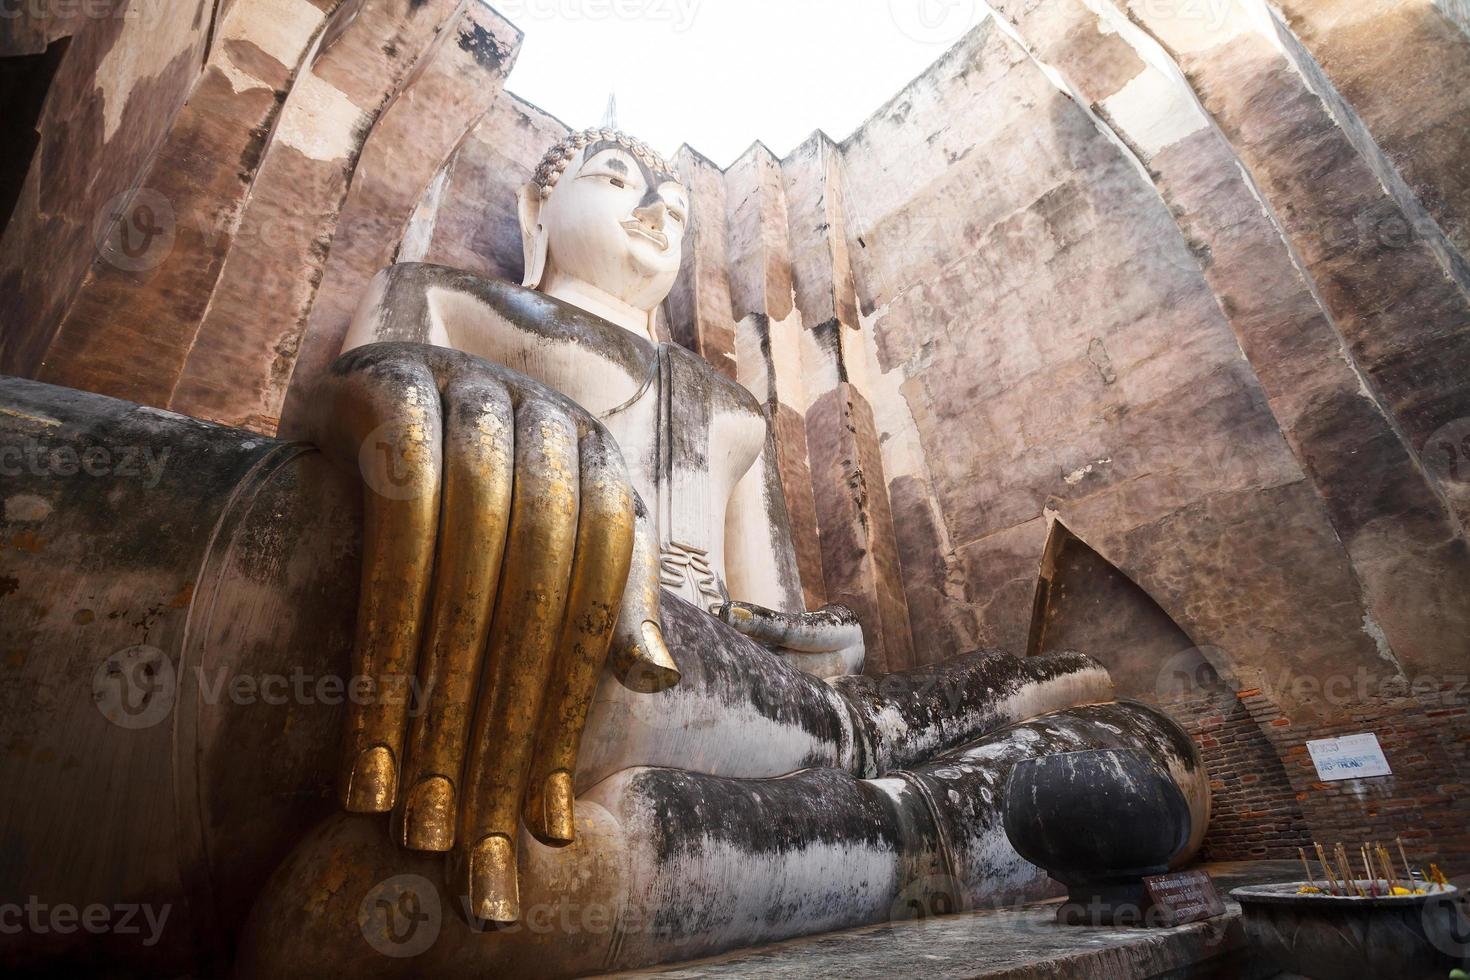 Antigua estatua de Buda. Parque histórico de Sukhothai, Tailandia foto